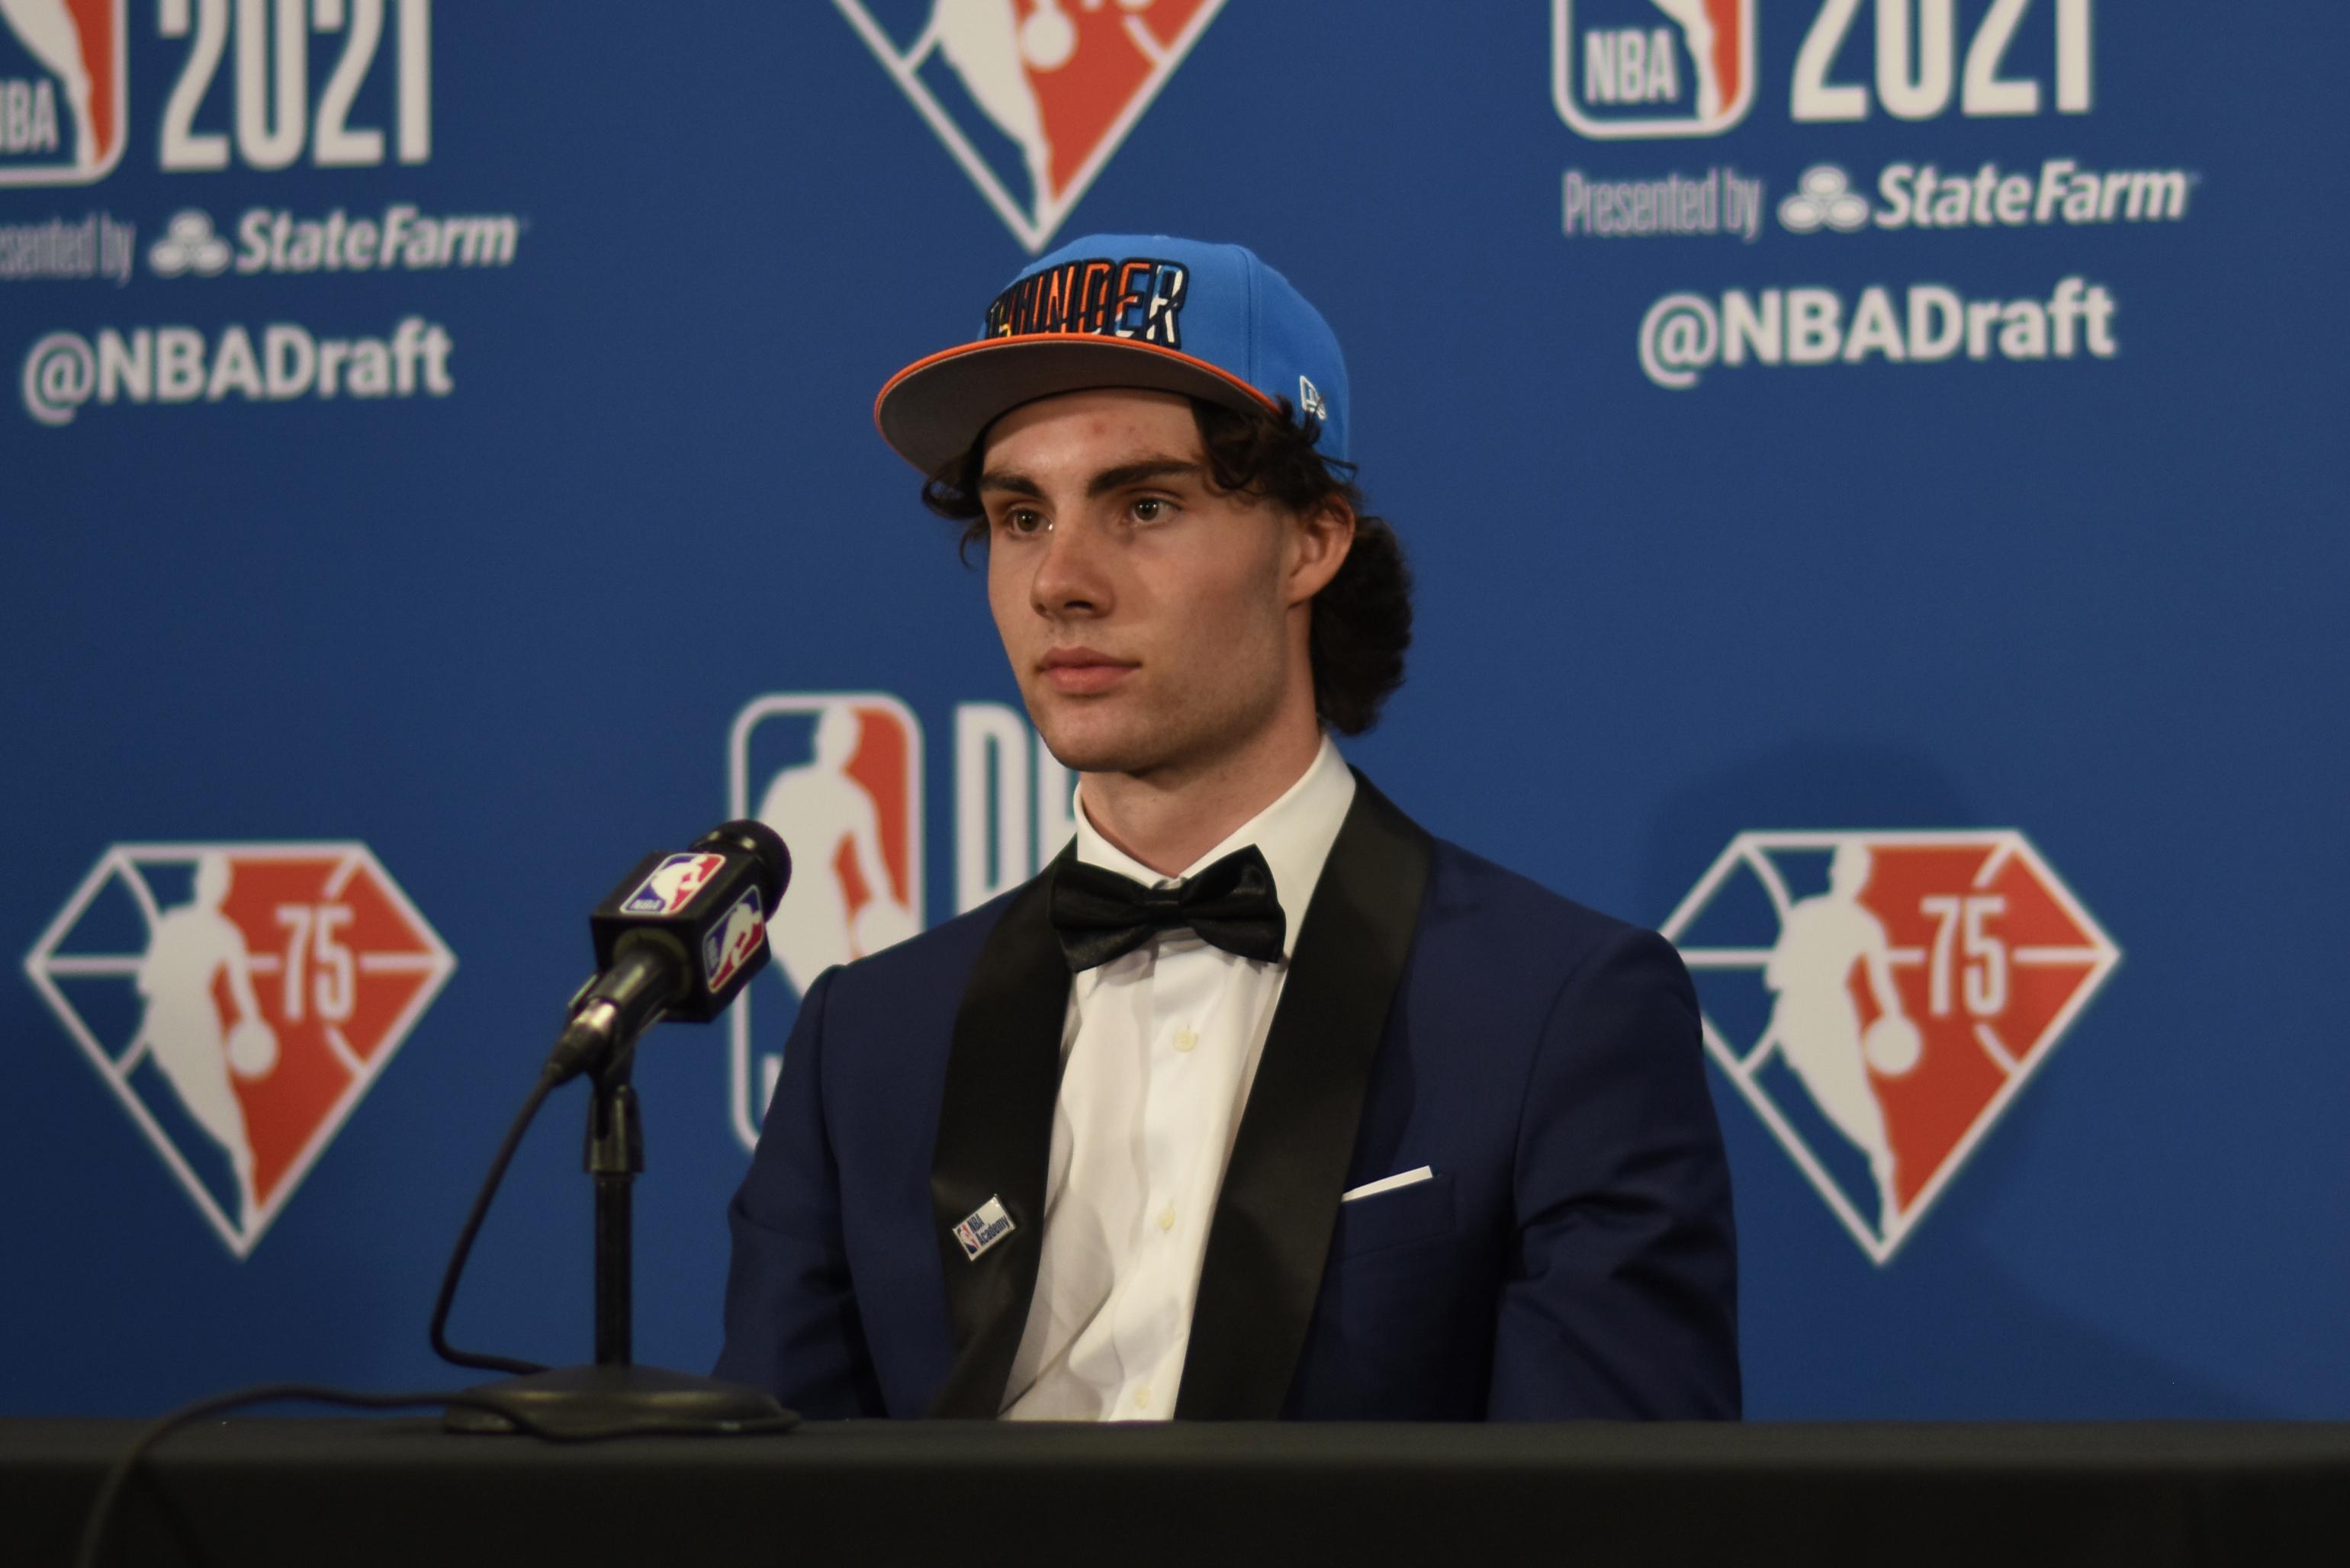 2021 NBA Draft